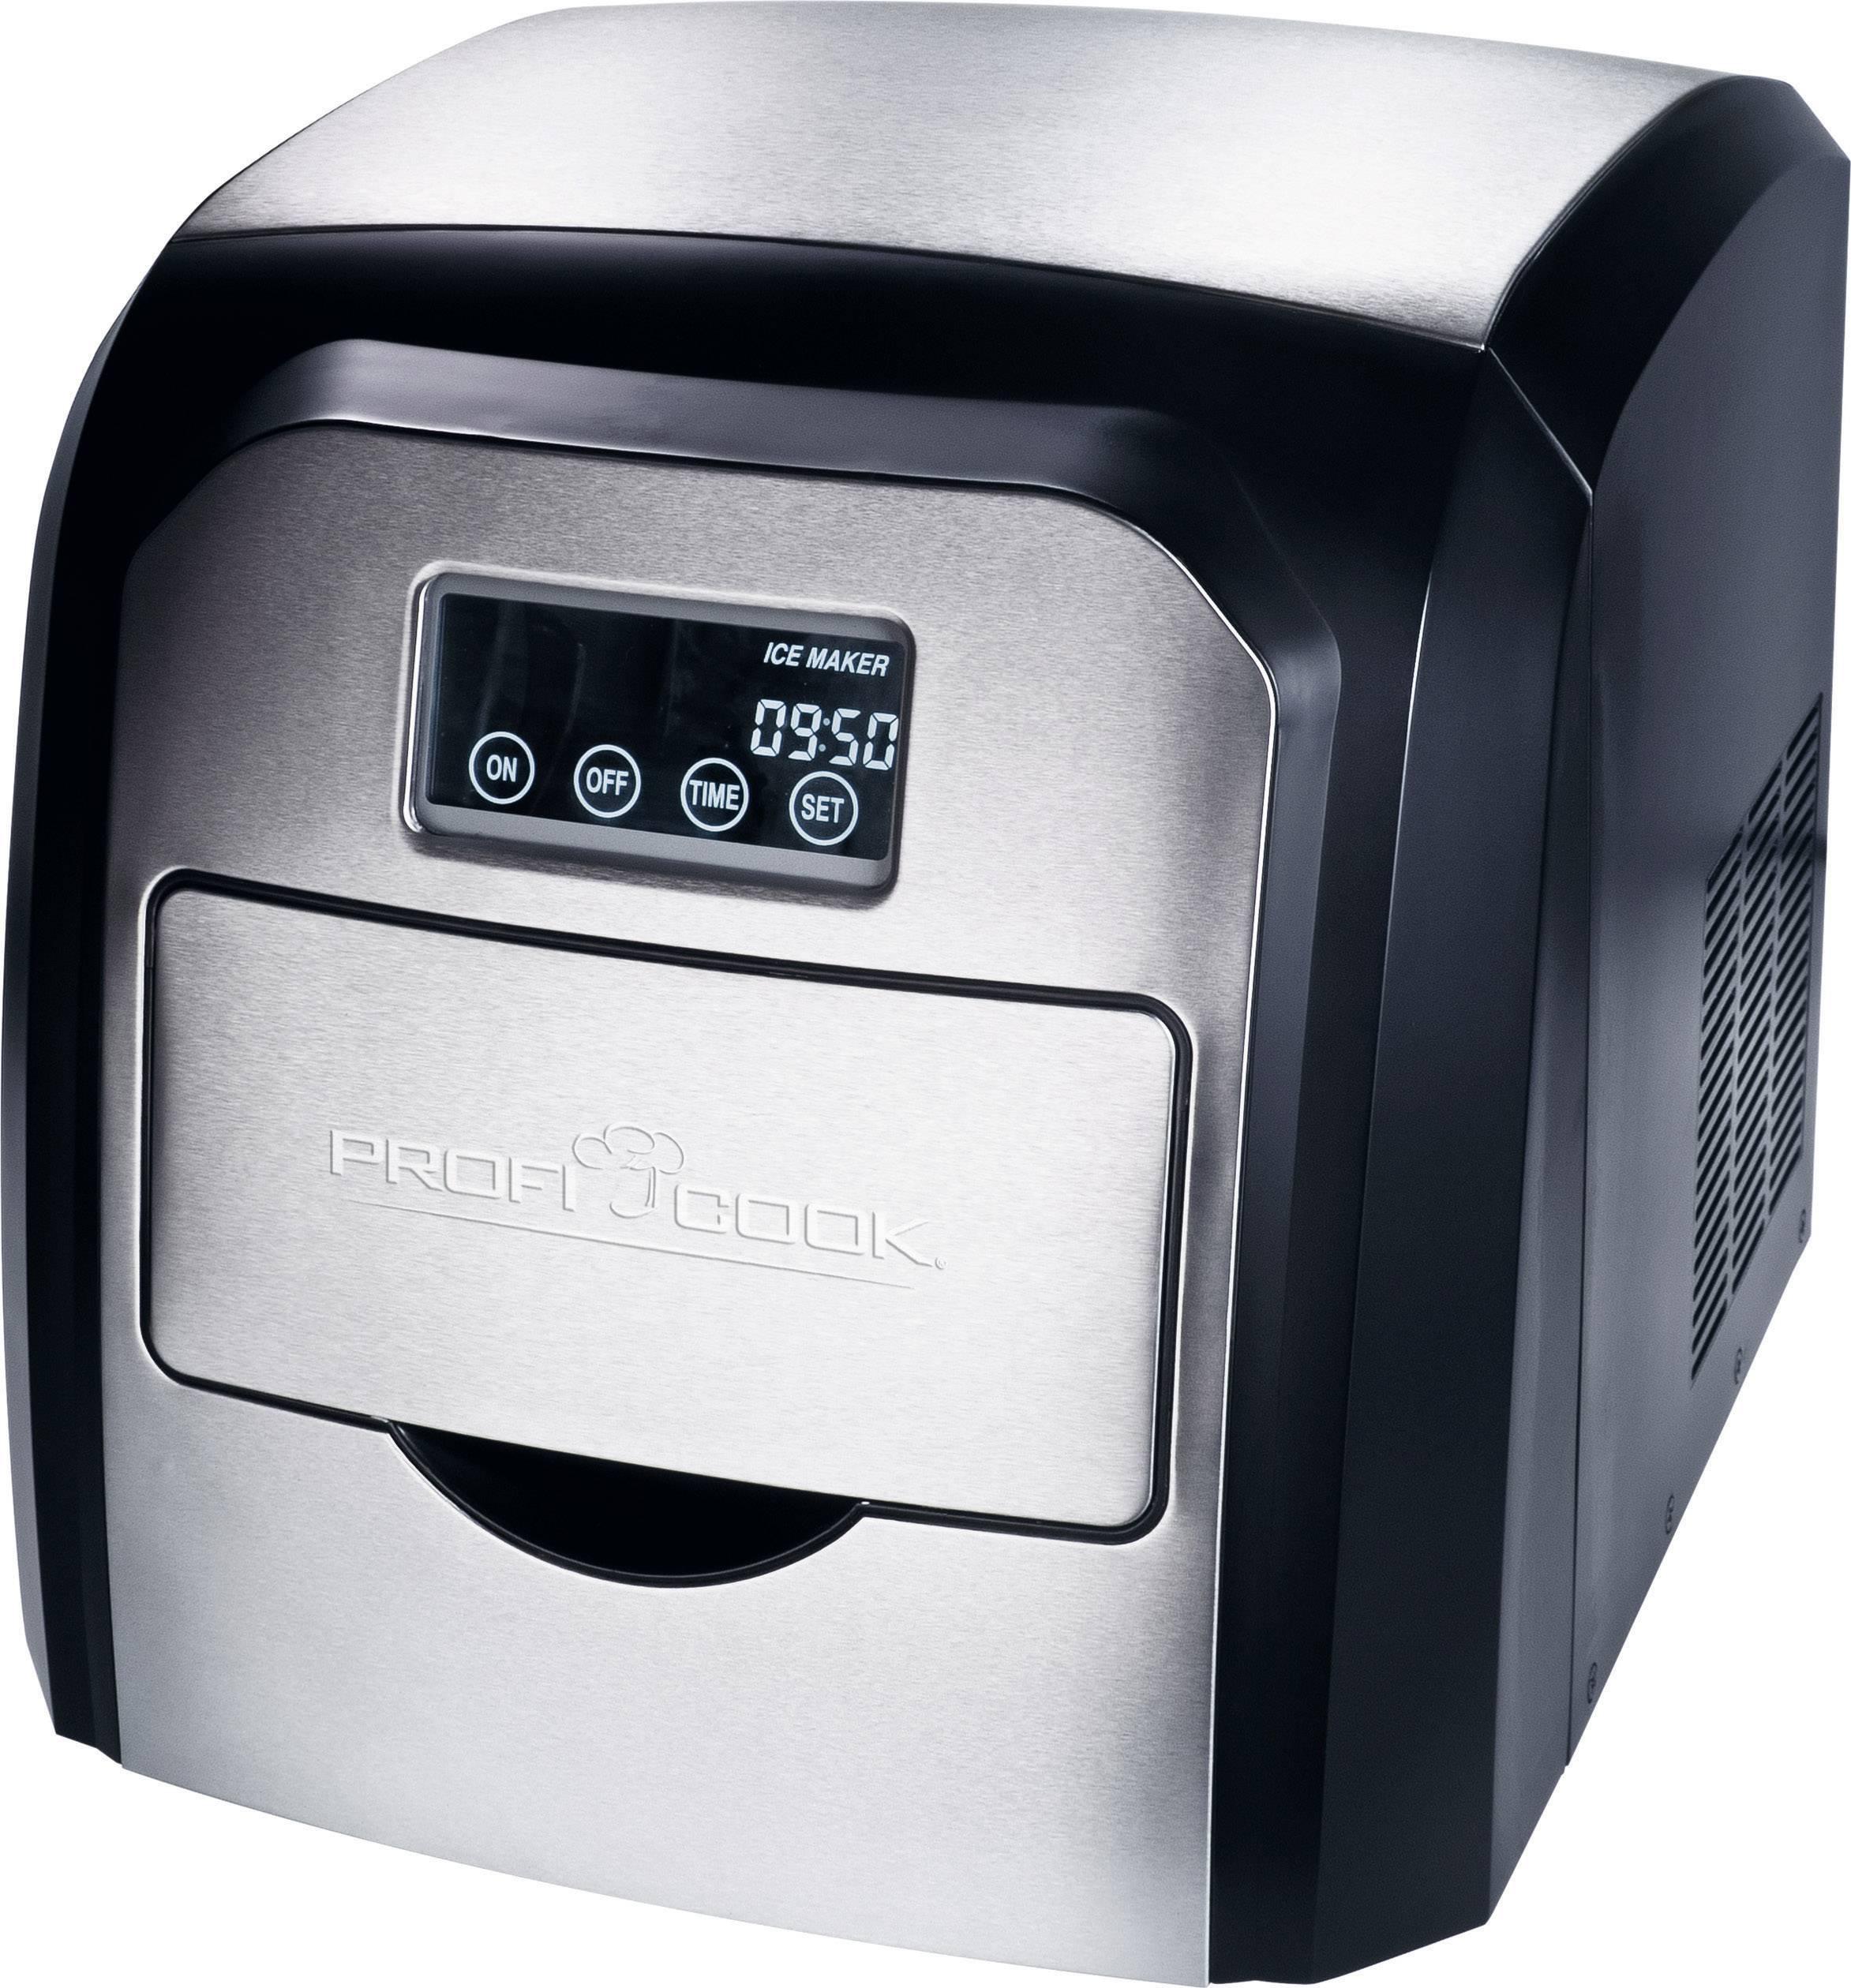 Výrobník ľadu Profi Cook PC-EWB 1007, 1.8 l